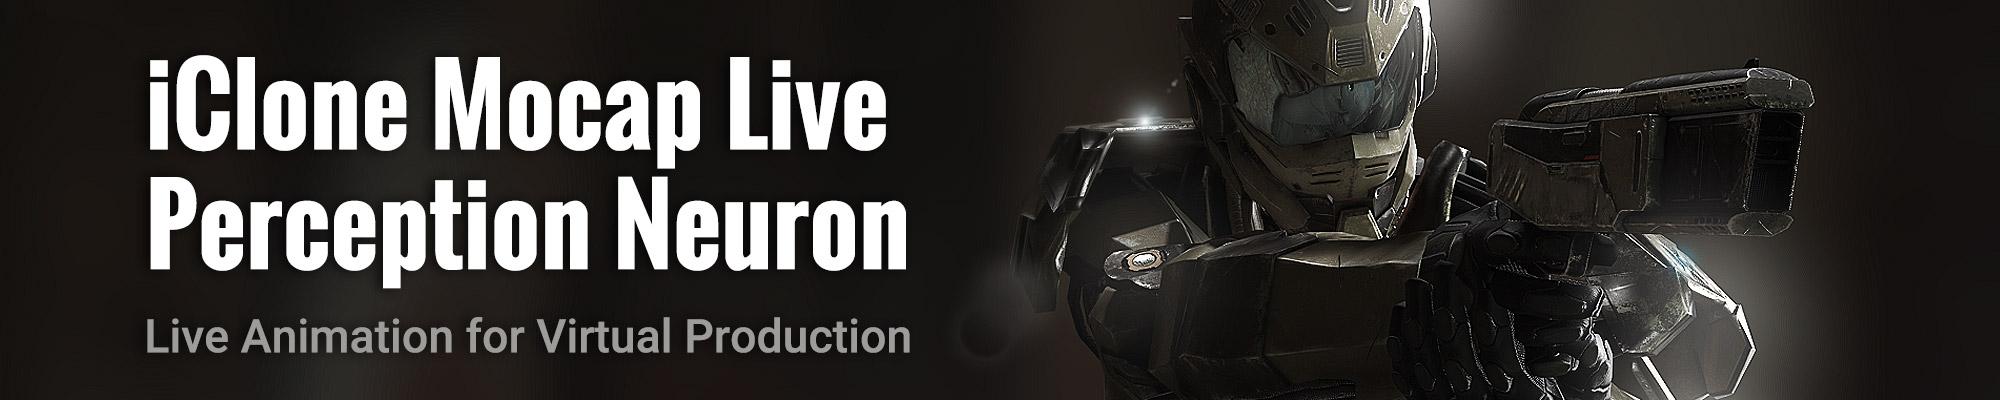 iClone Mocap Live for Perception Neuron